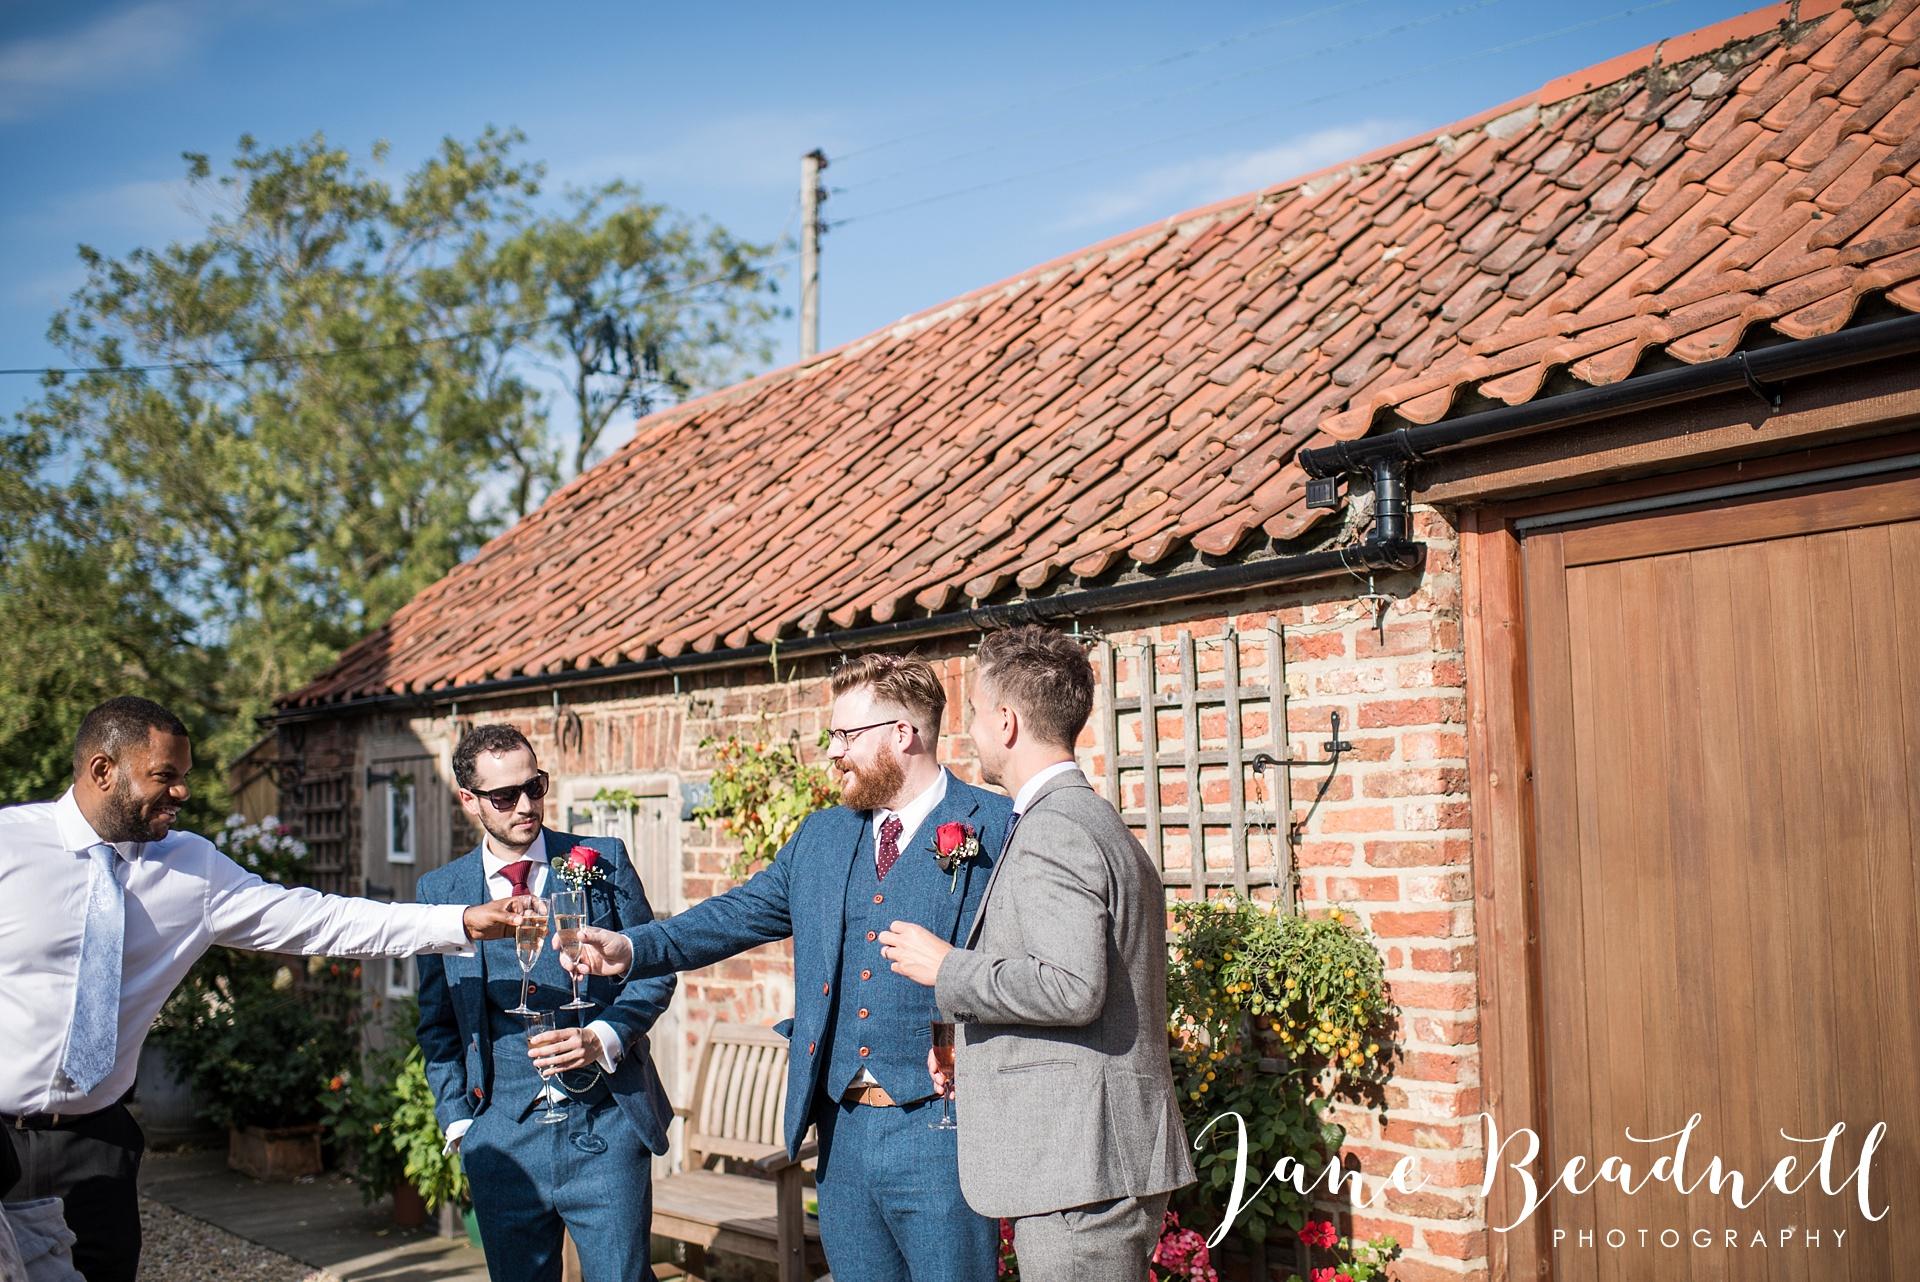 fine-art-wedding-photographer-jane-beadnell-yorkshire-wedding-photographer_0073